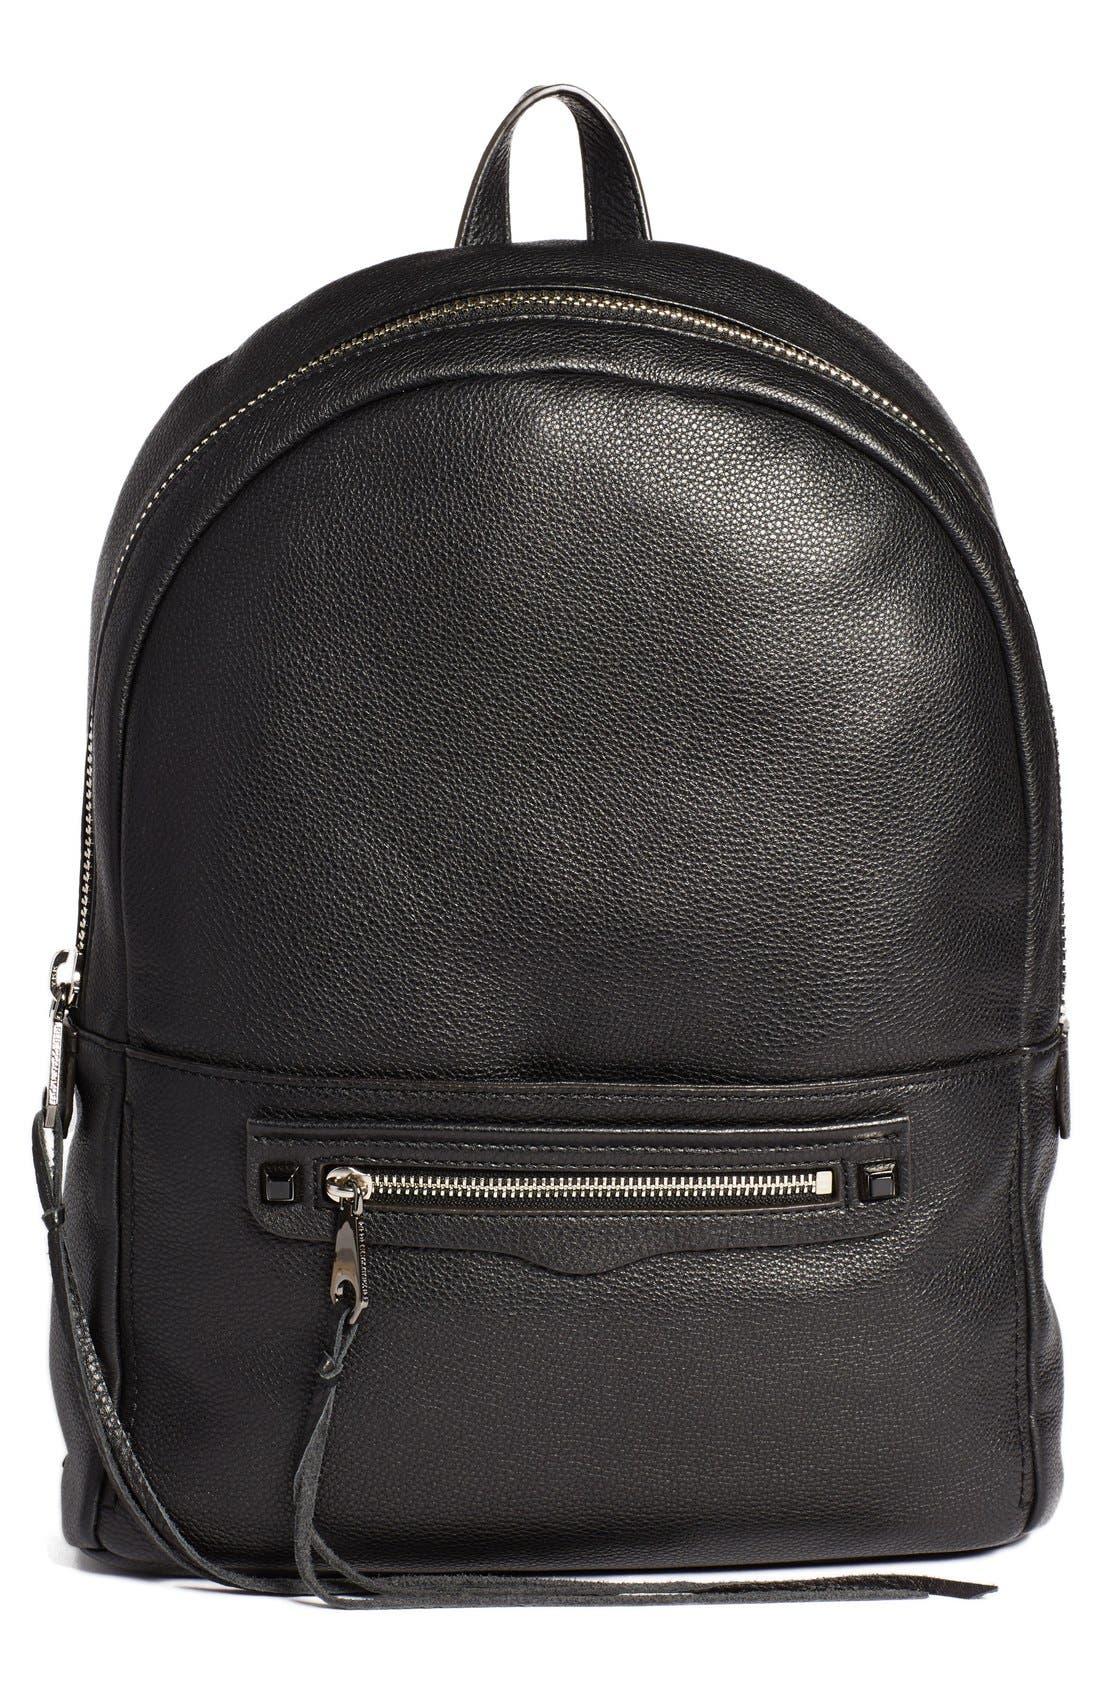 Main Image - Rebecca Minkoff 'Always On Regan' Leather Backpack